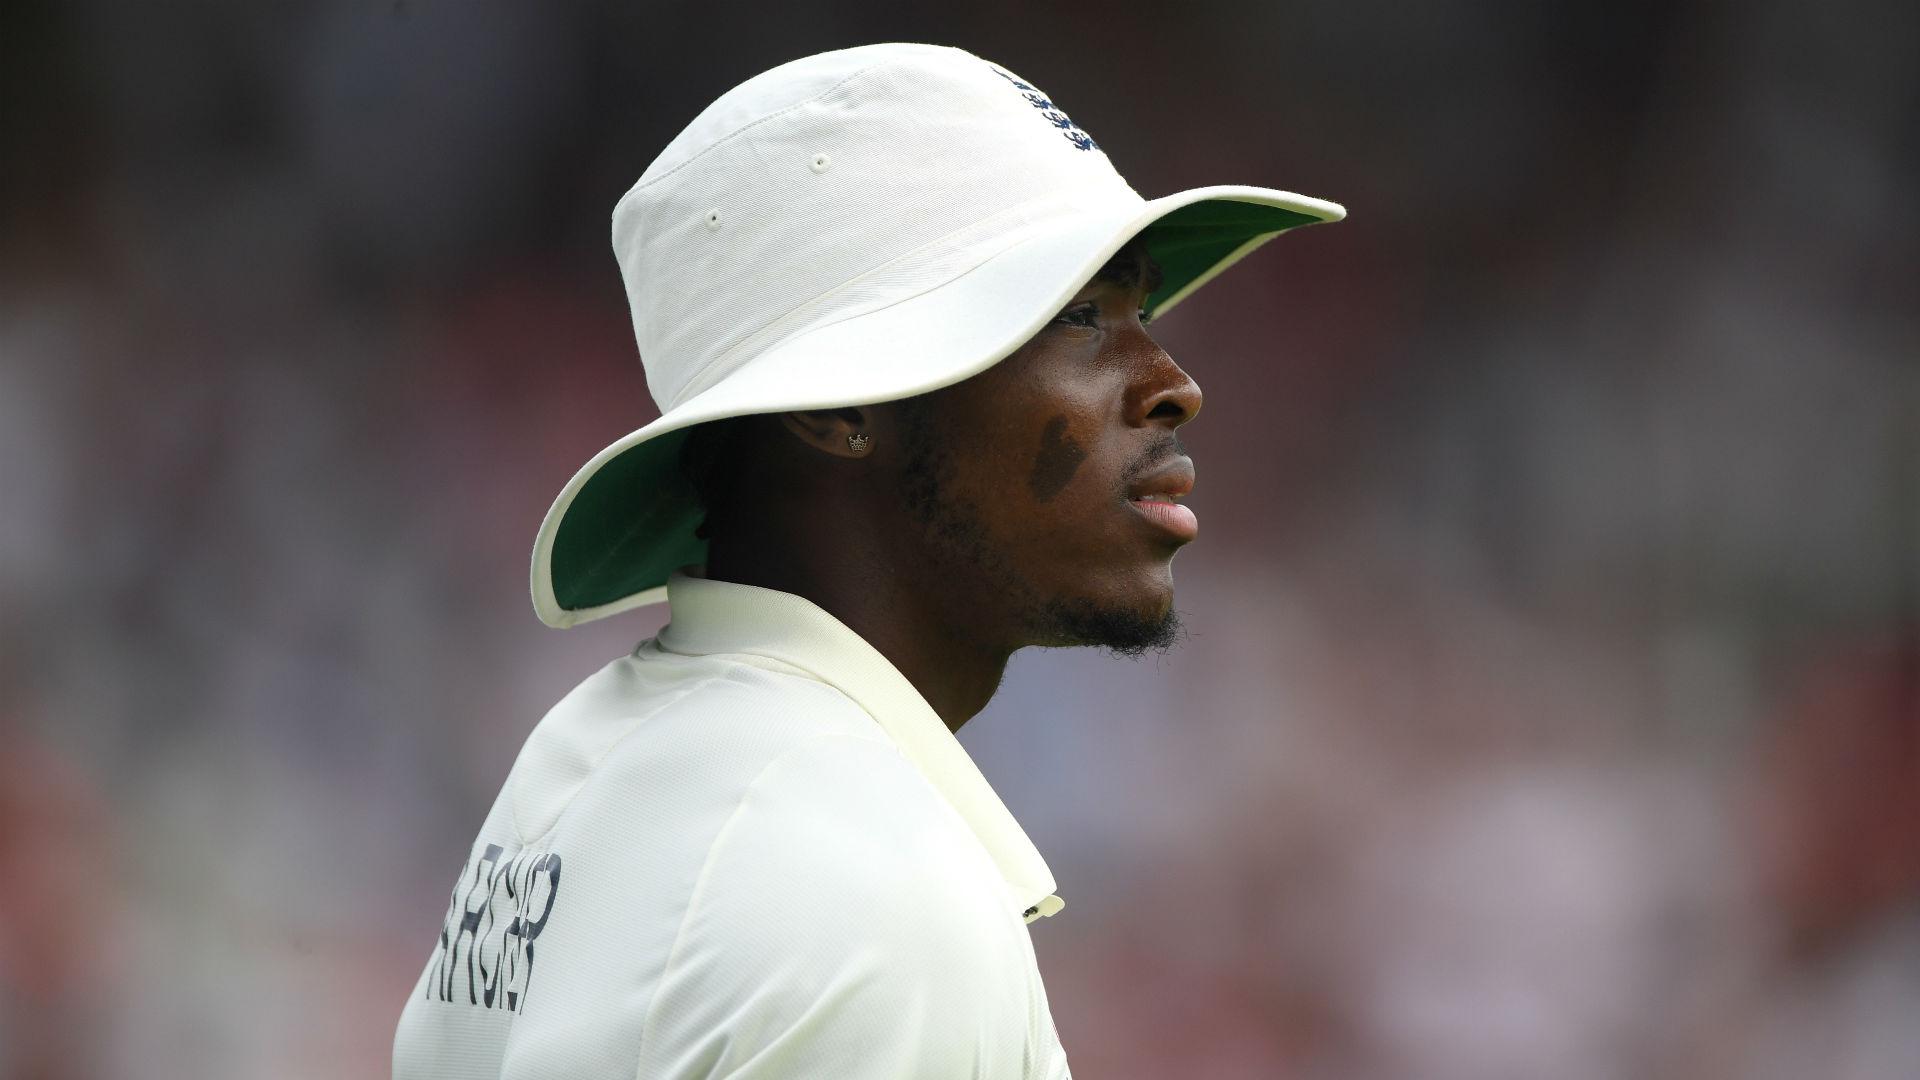 Ashes 2019: Archer no unknown for Australia, says Cummins | CRICKET